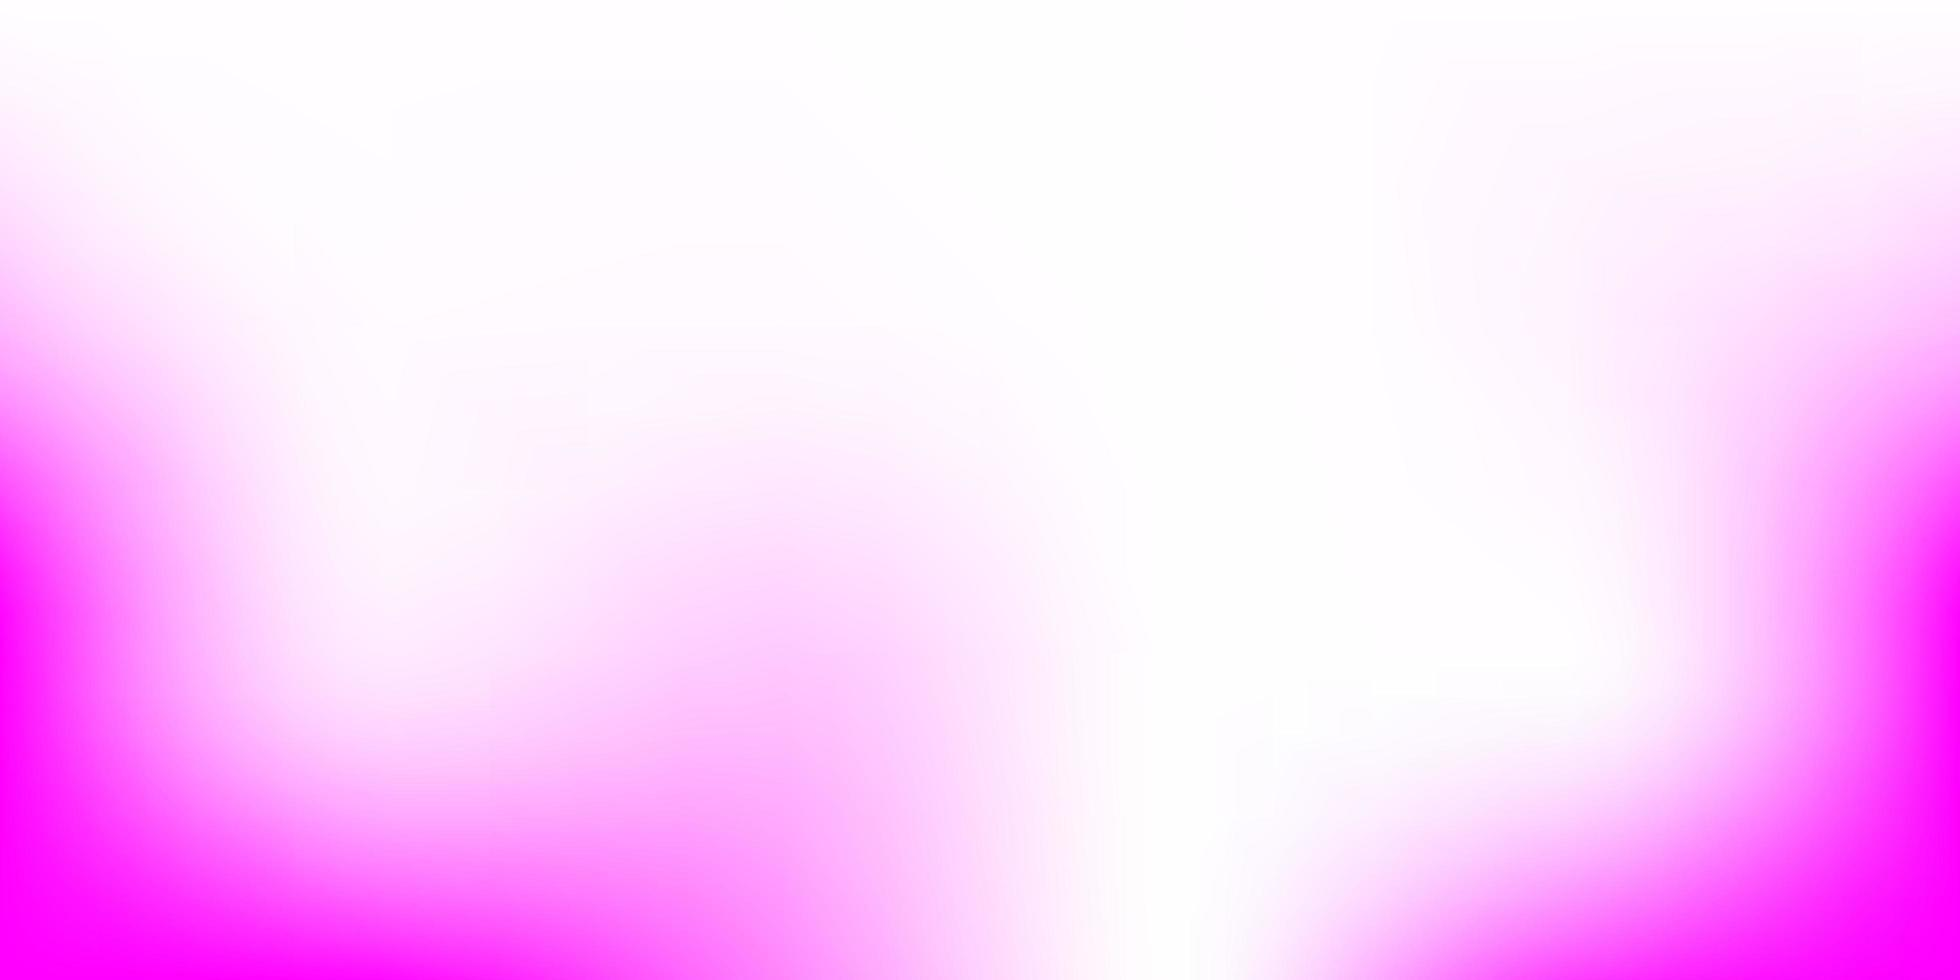 vector de color rosa claro fondo borroso.